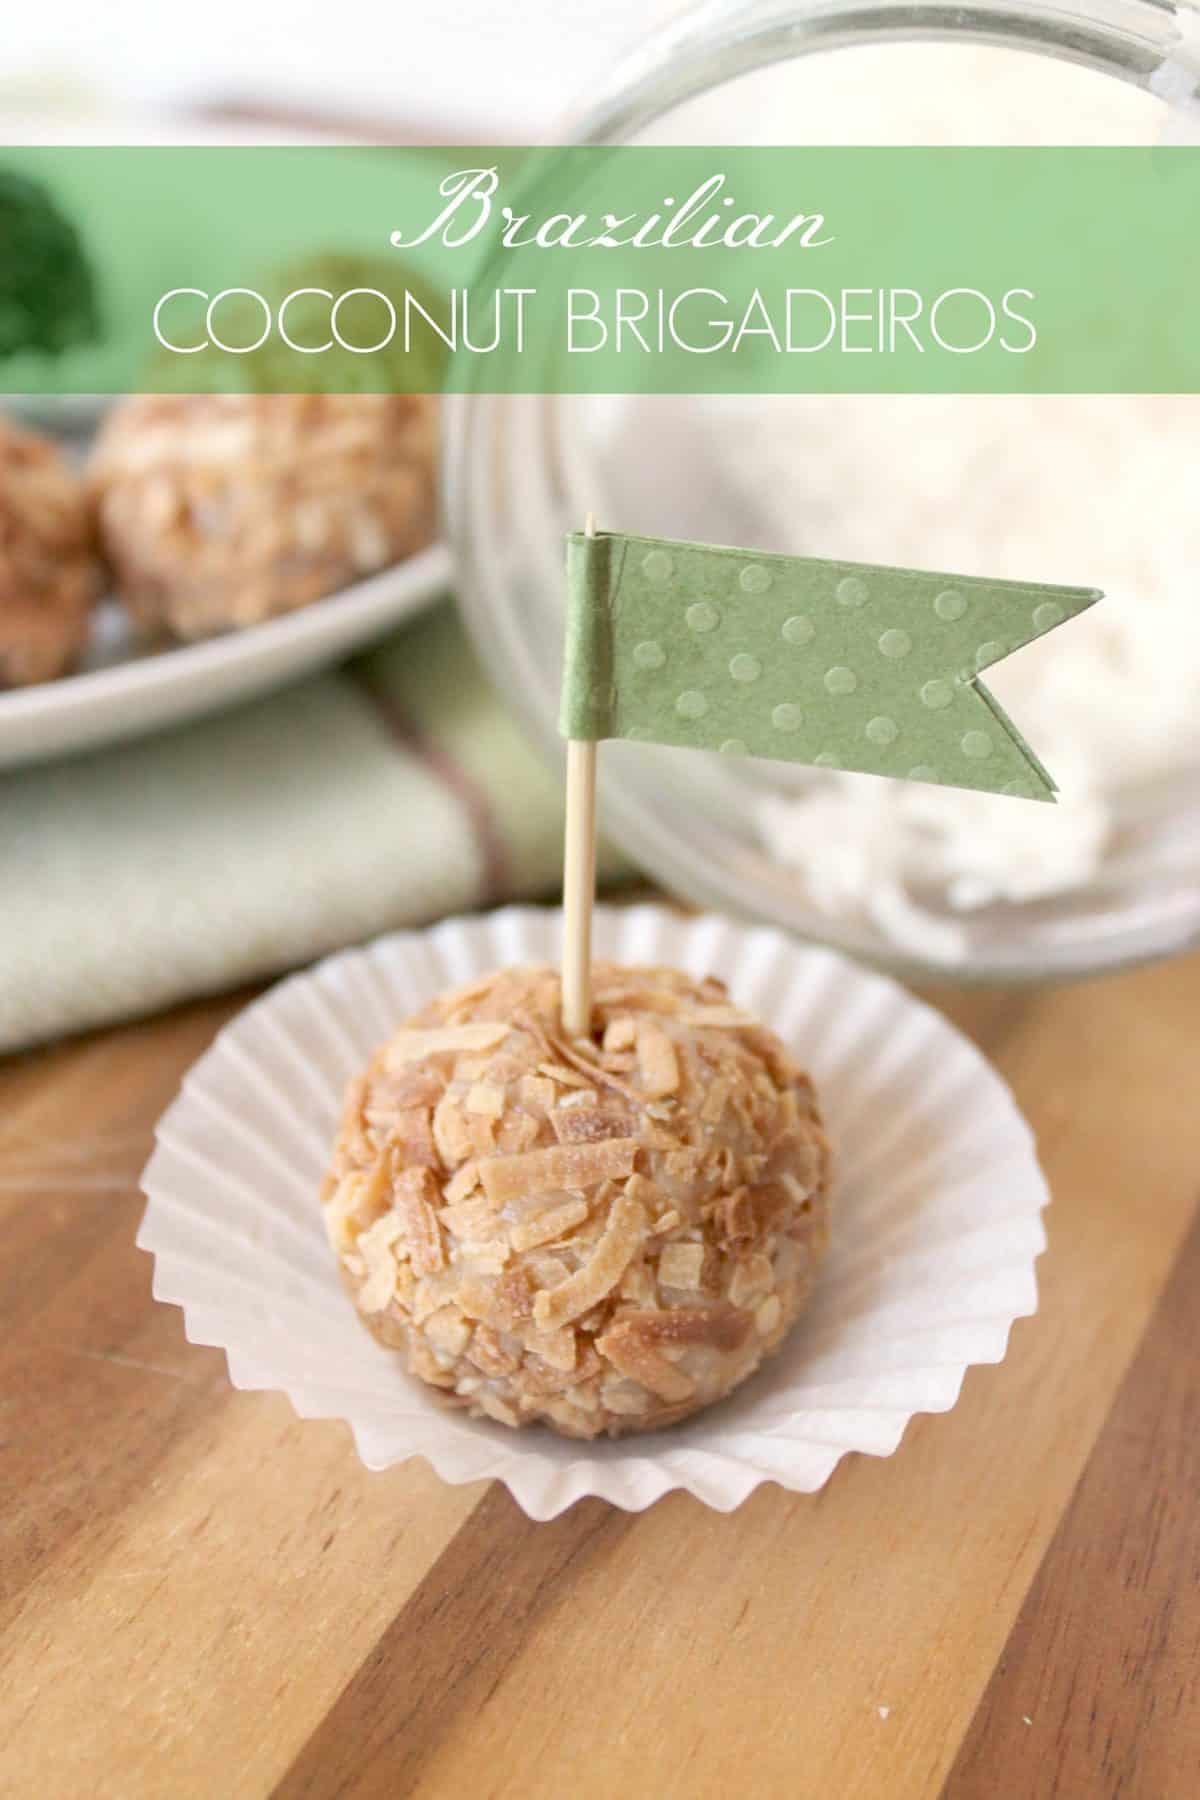 Brazilian Coconut Brigadeiros from The Kitchen Prep on KatiesCucina.com